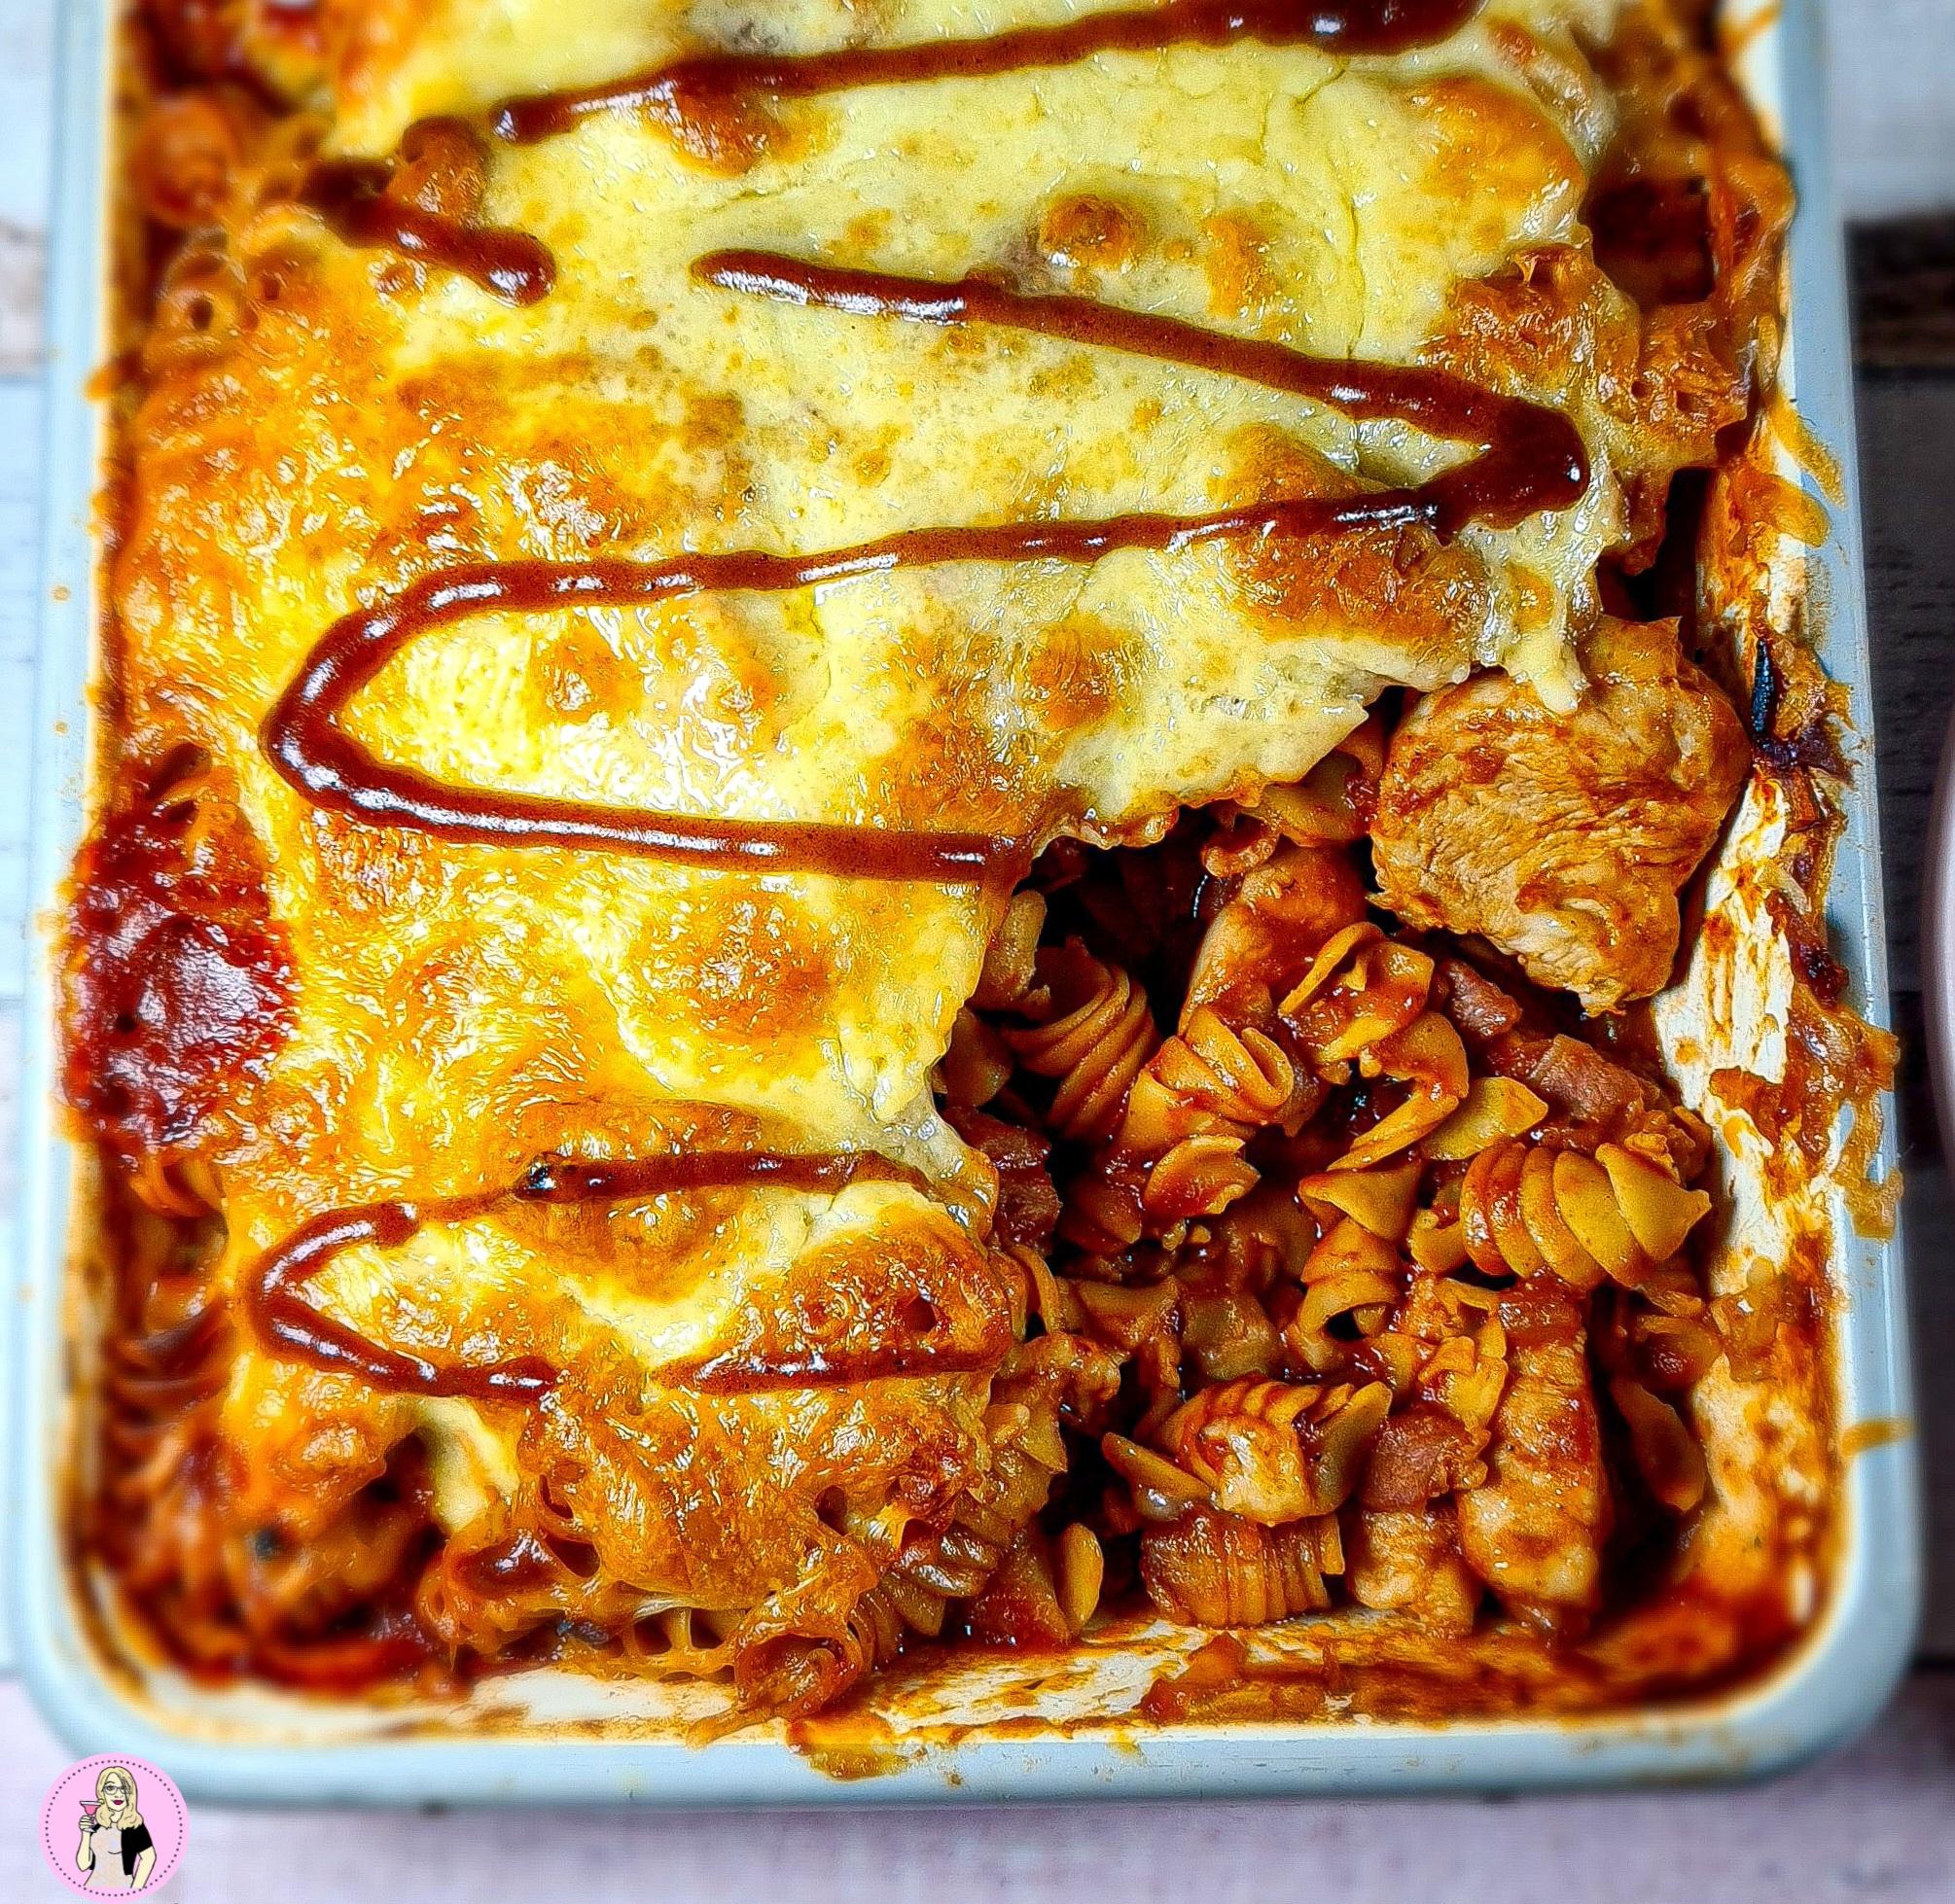 Hunters Chicken Pasta Bake Recipe | Slimming Friendly